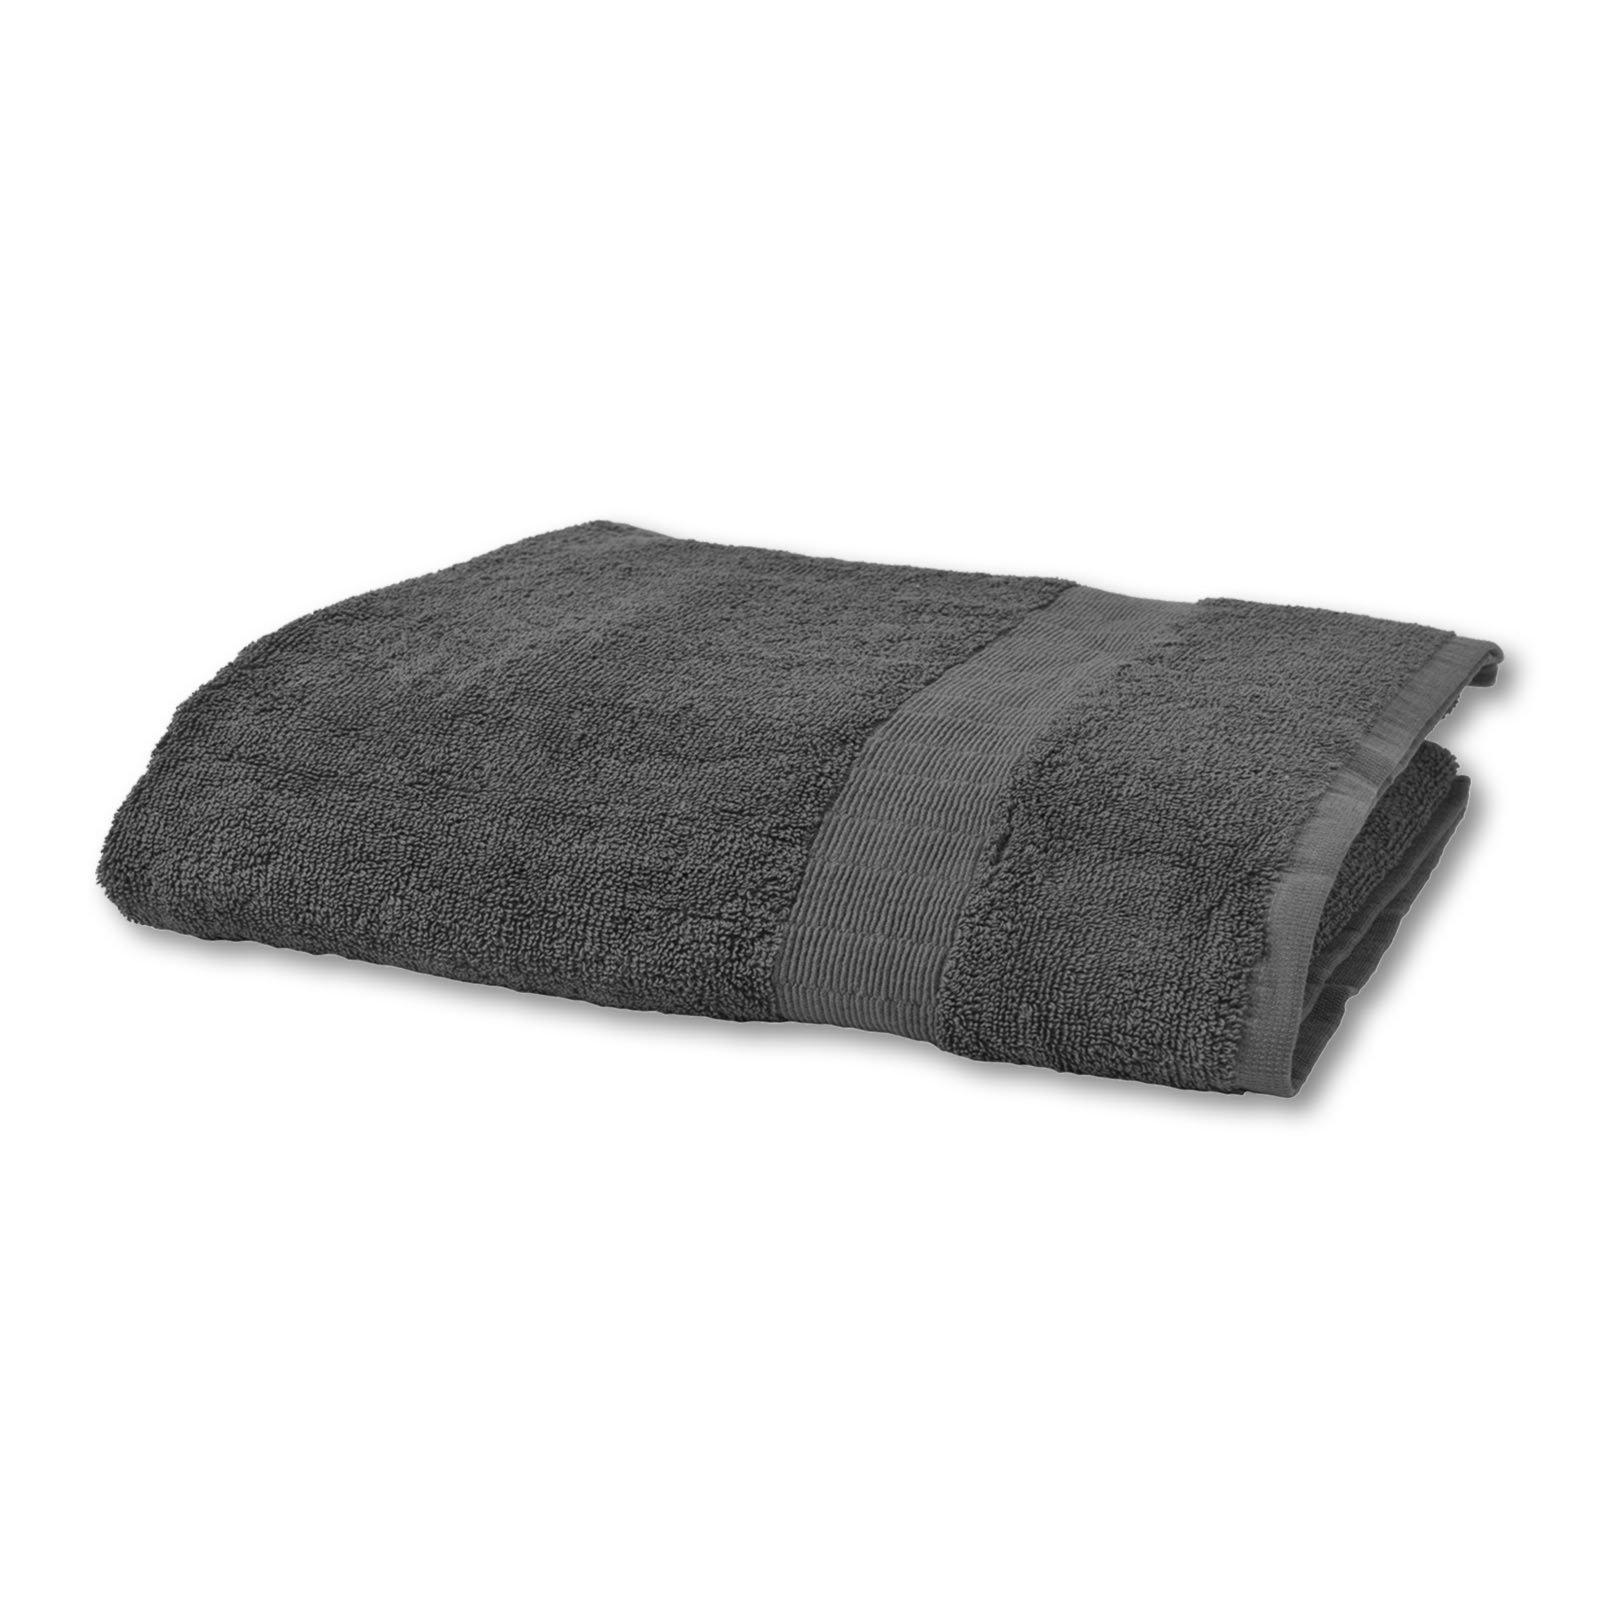 Handtuch CAESAR - grau - Baumwolle - 50x100 cm